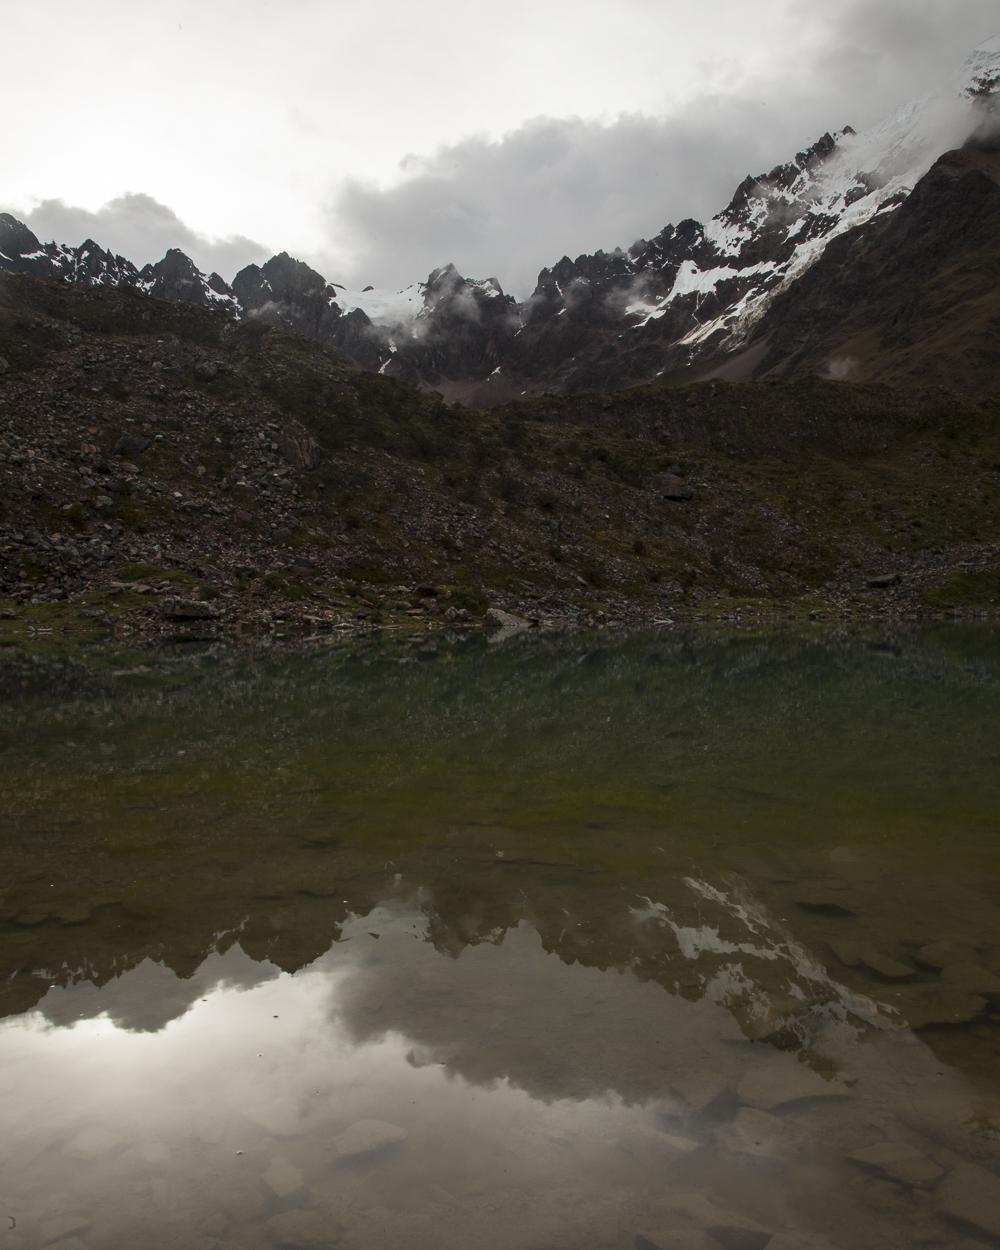 Abra Salkantay, Peru 2014